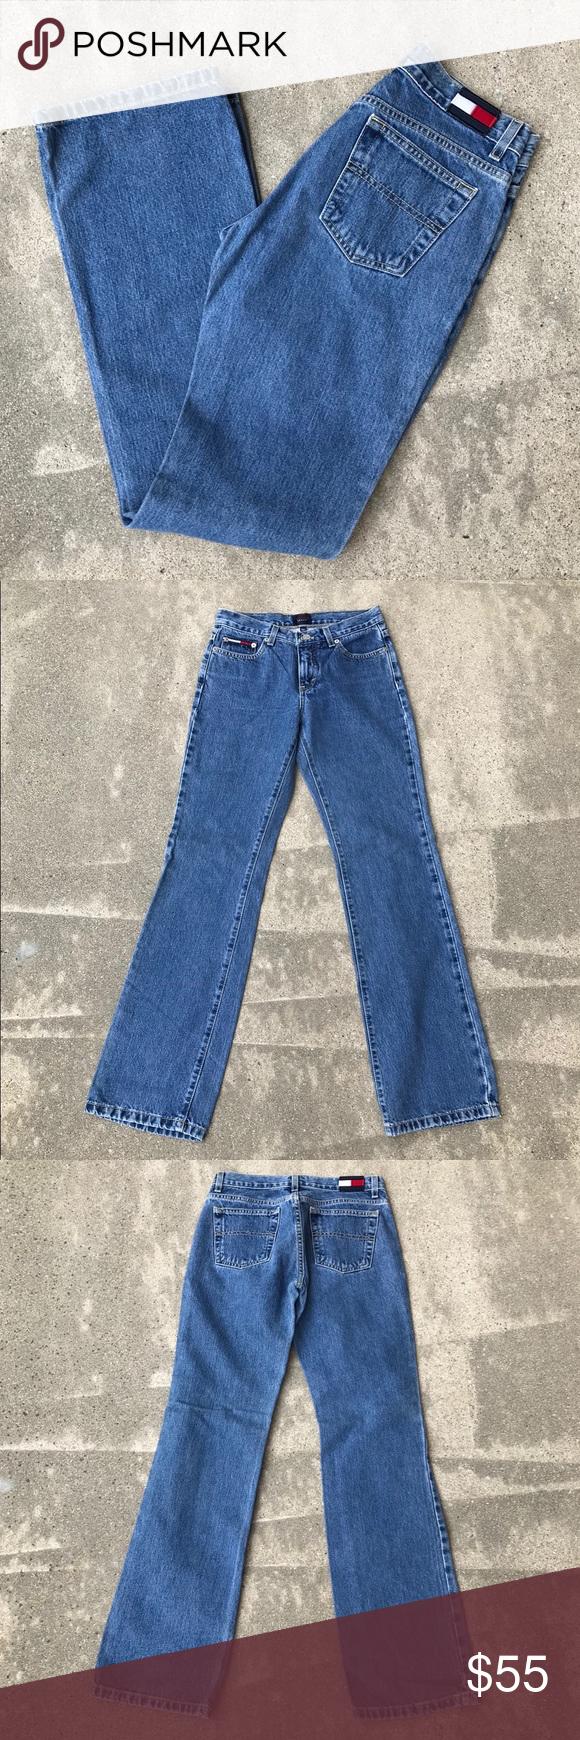 vintage tommy hilfiger patch jeans tommy hilfiger jeans patched